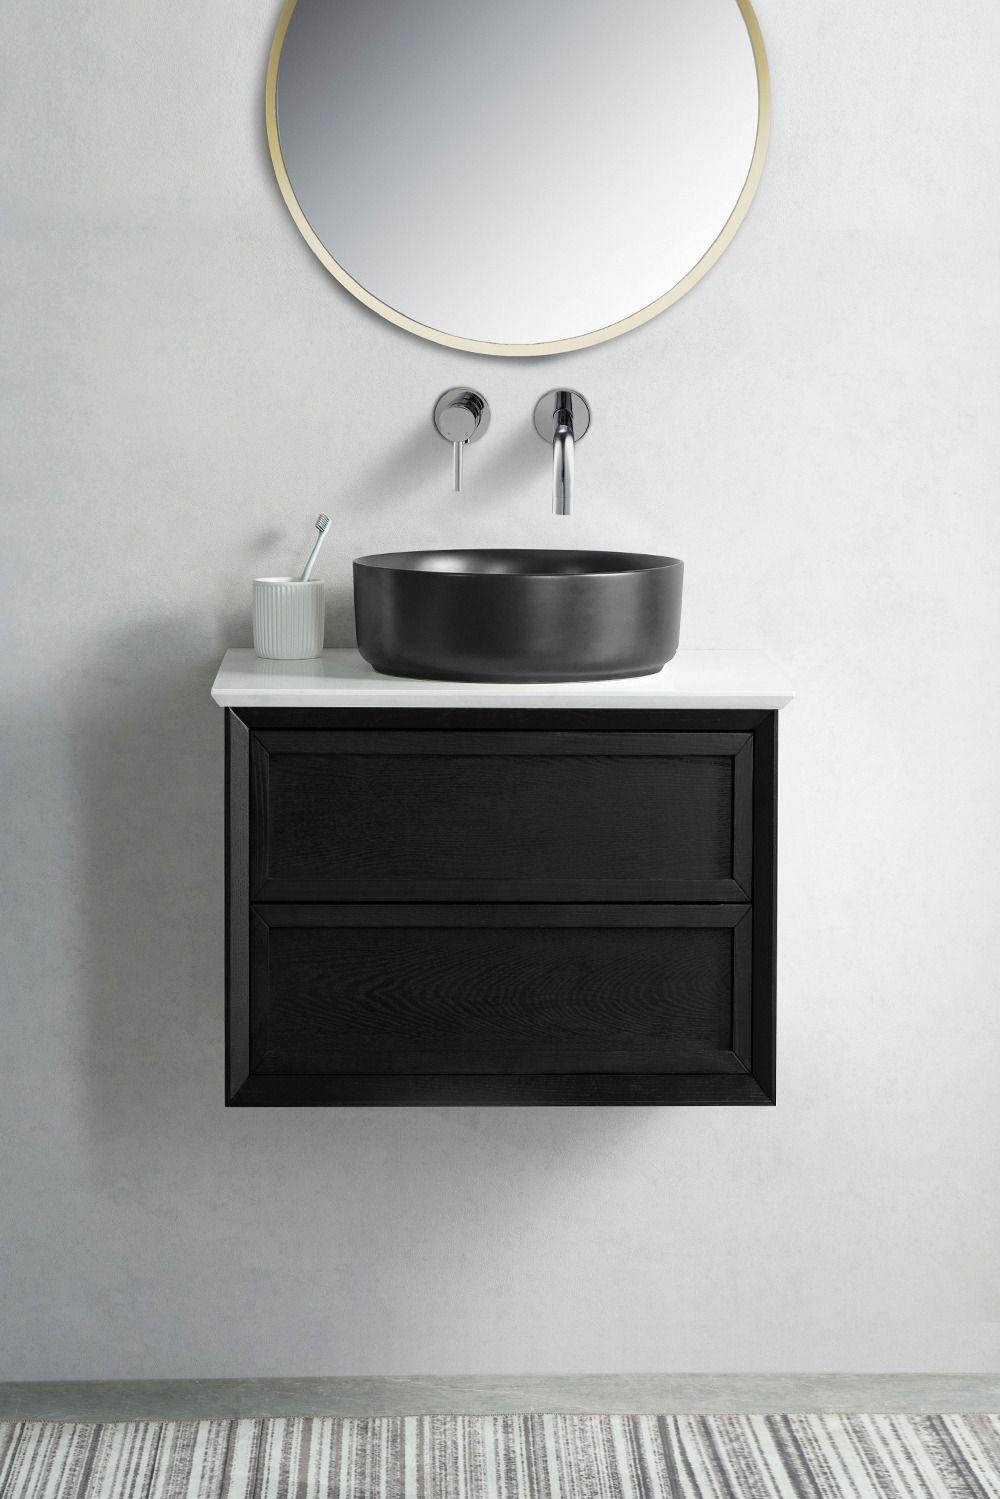 Penley 60 Quartz Top Wall Hung Vanity In 2020 Wall Hung Vanity Wall Hung Bathroom Vanities Solid Wood Cabinets